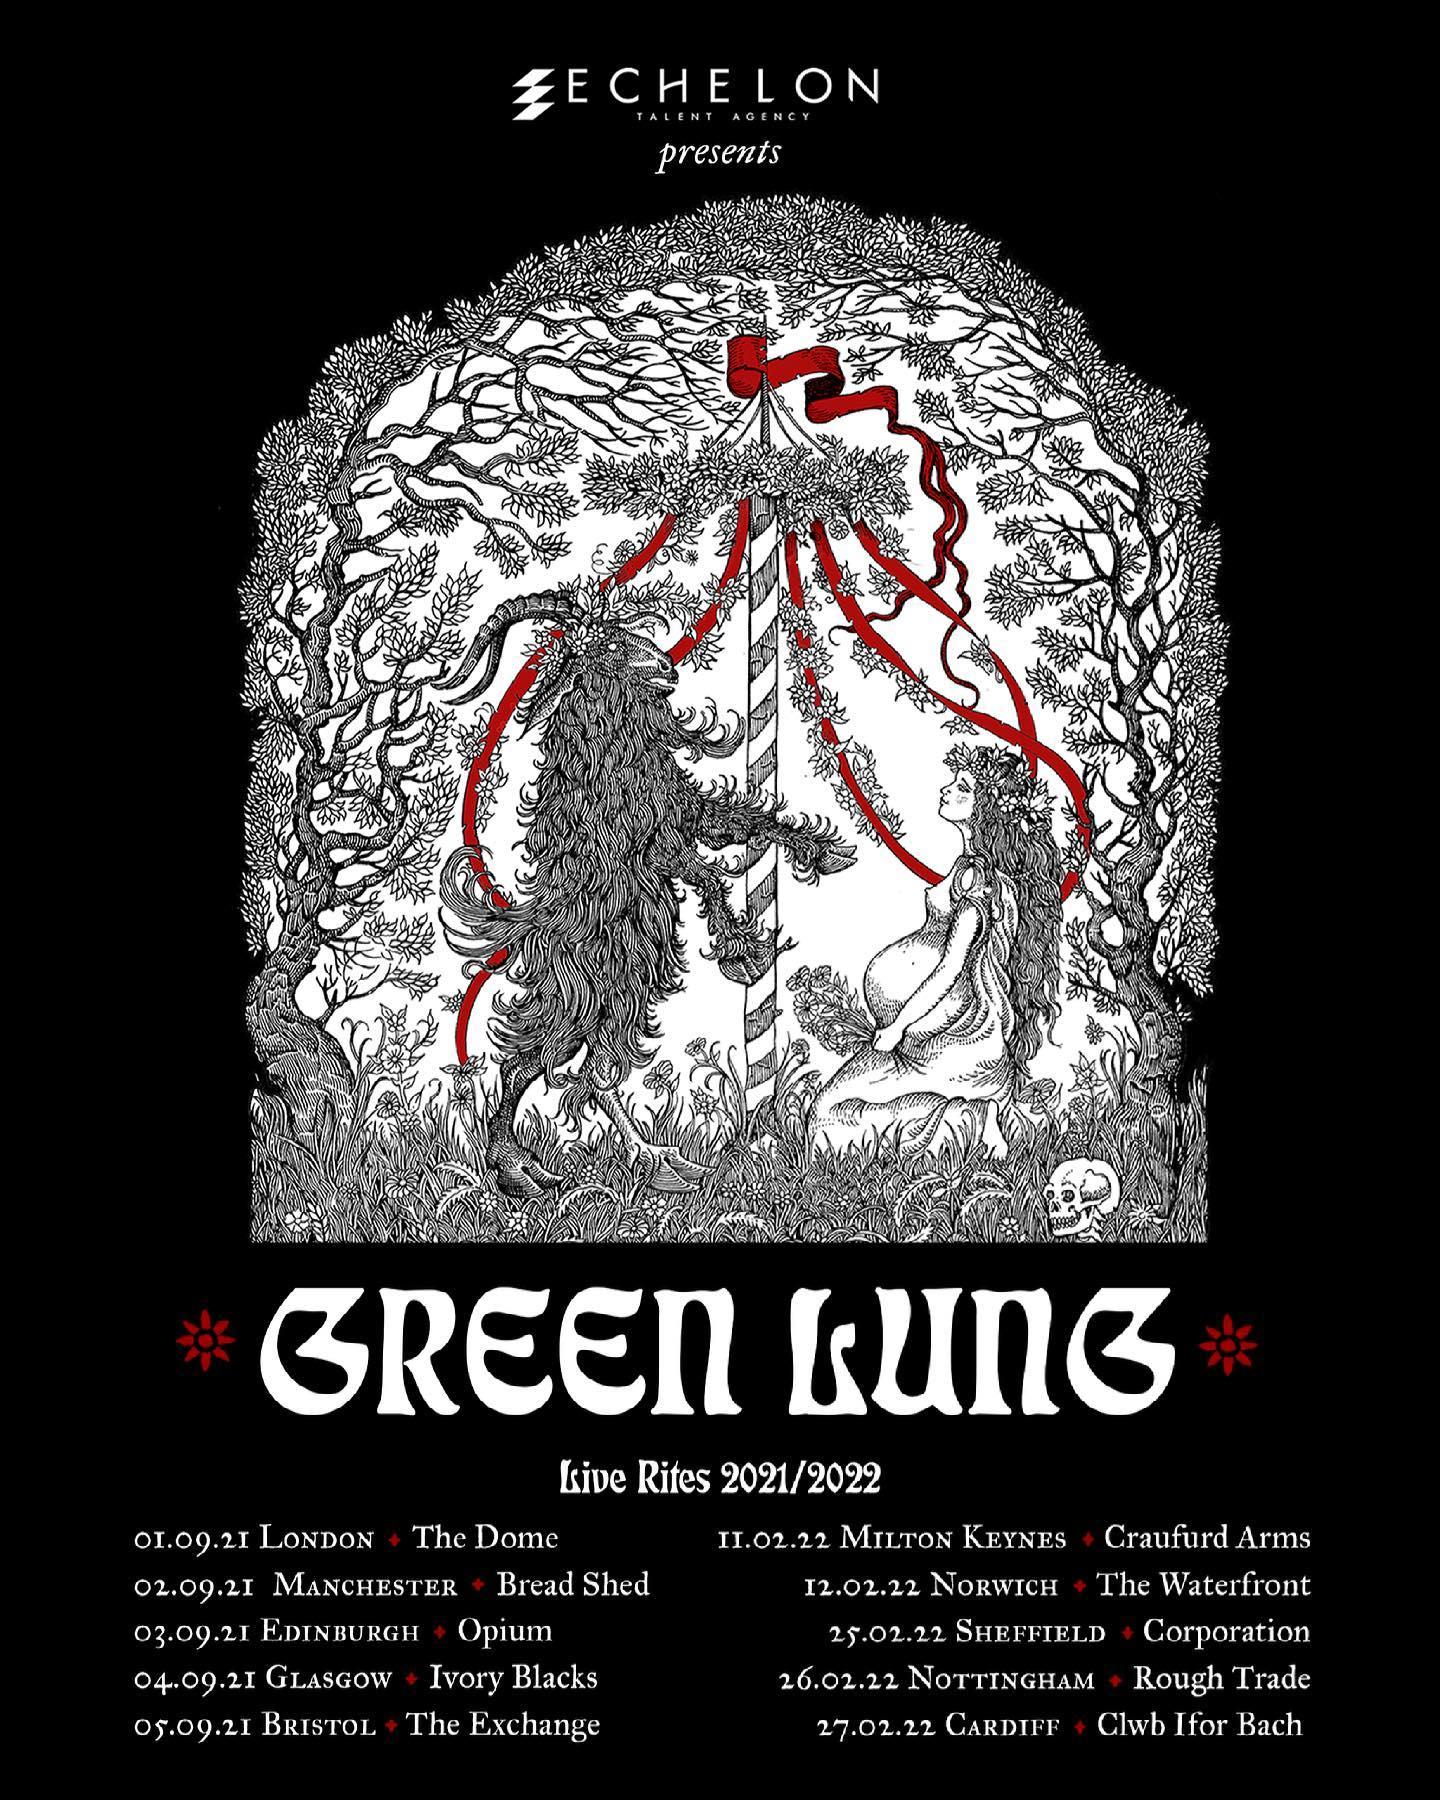 green lung tour